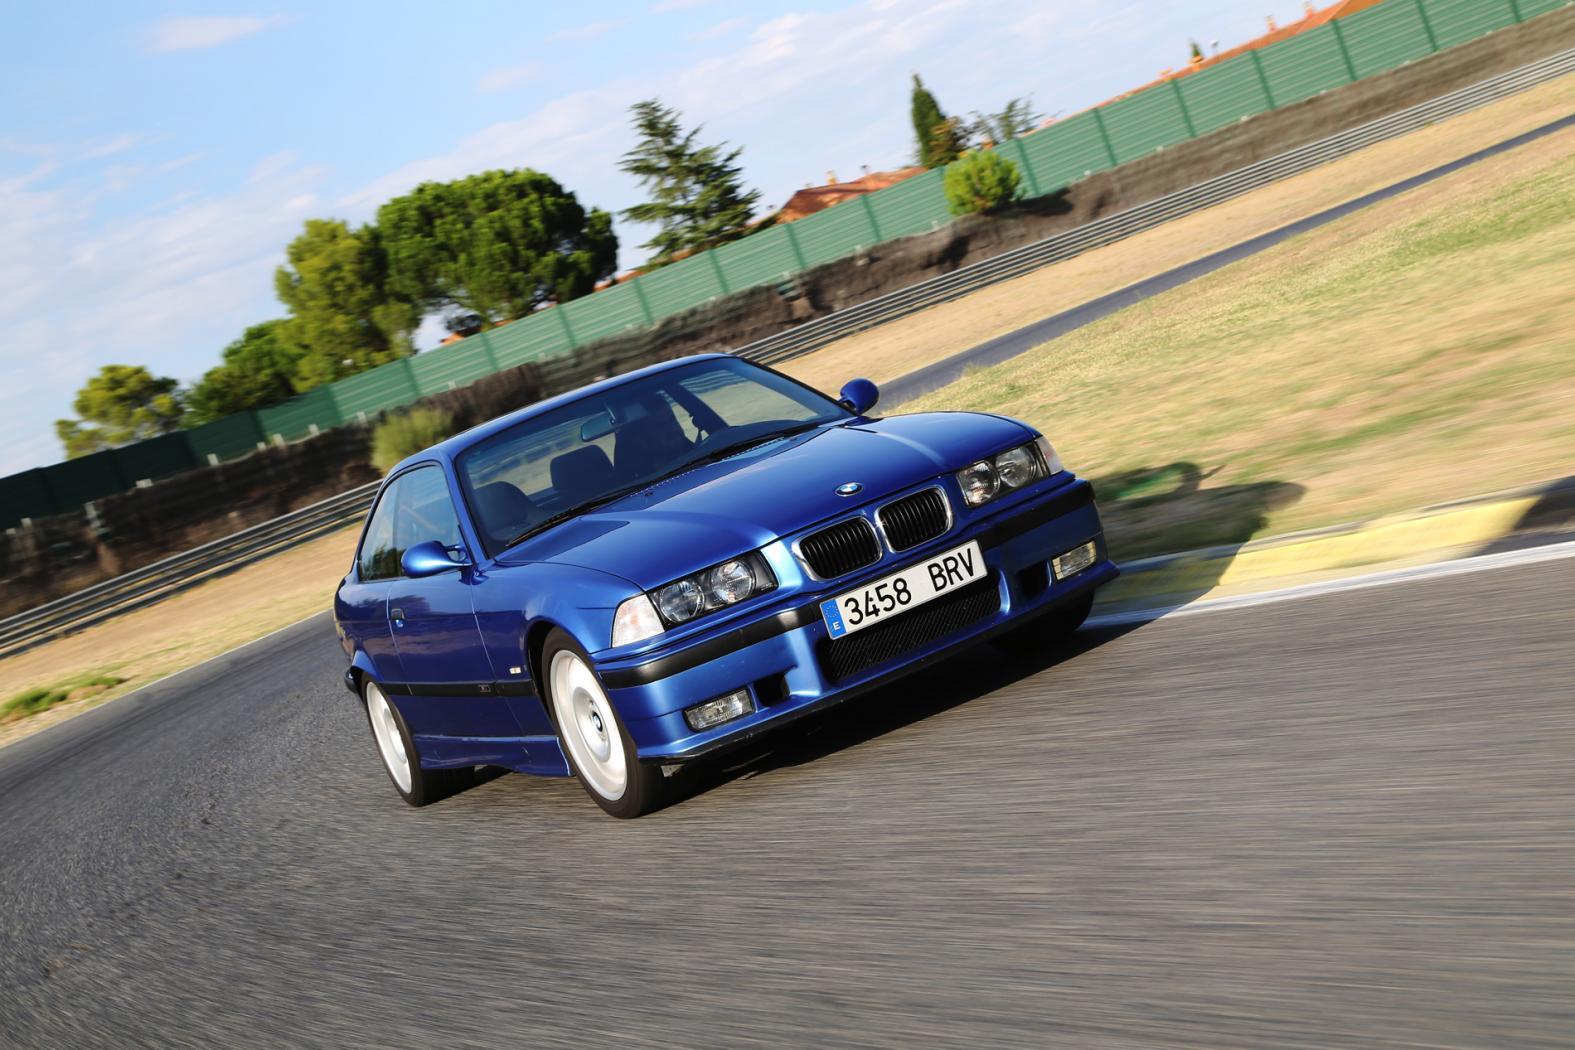 BMW-M3-E36_20170612-1519.jpeg